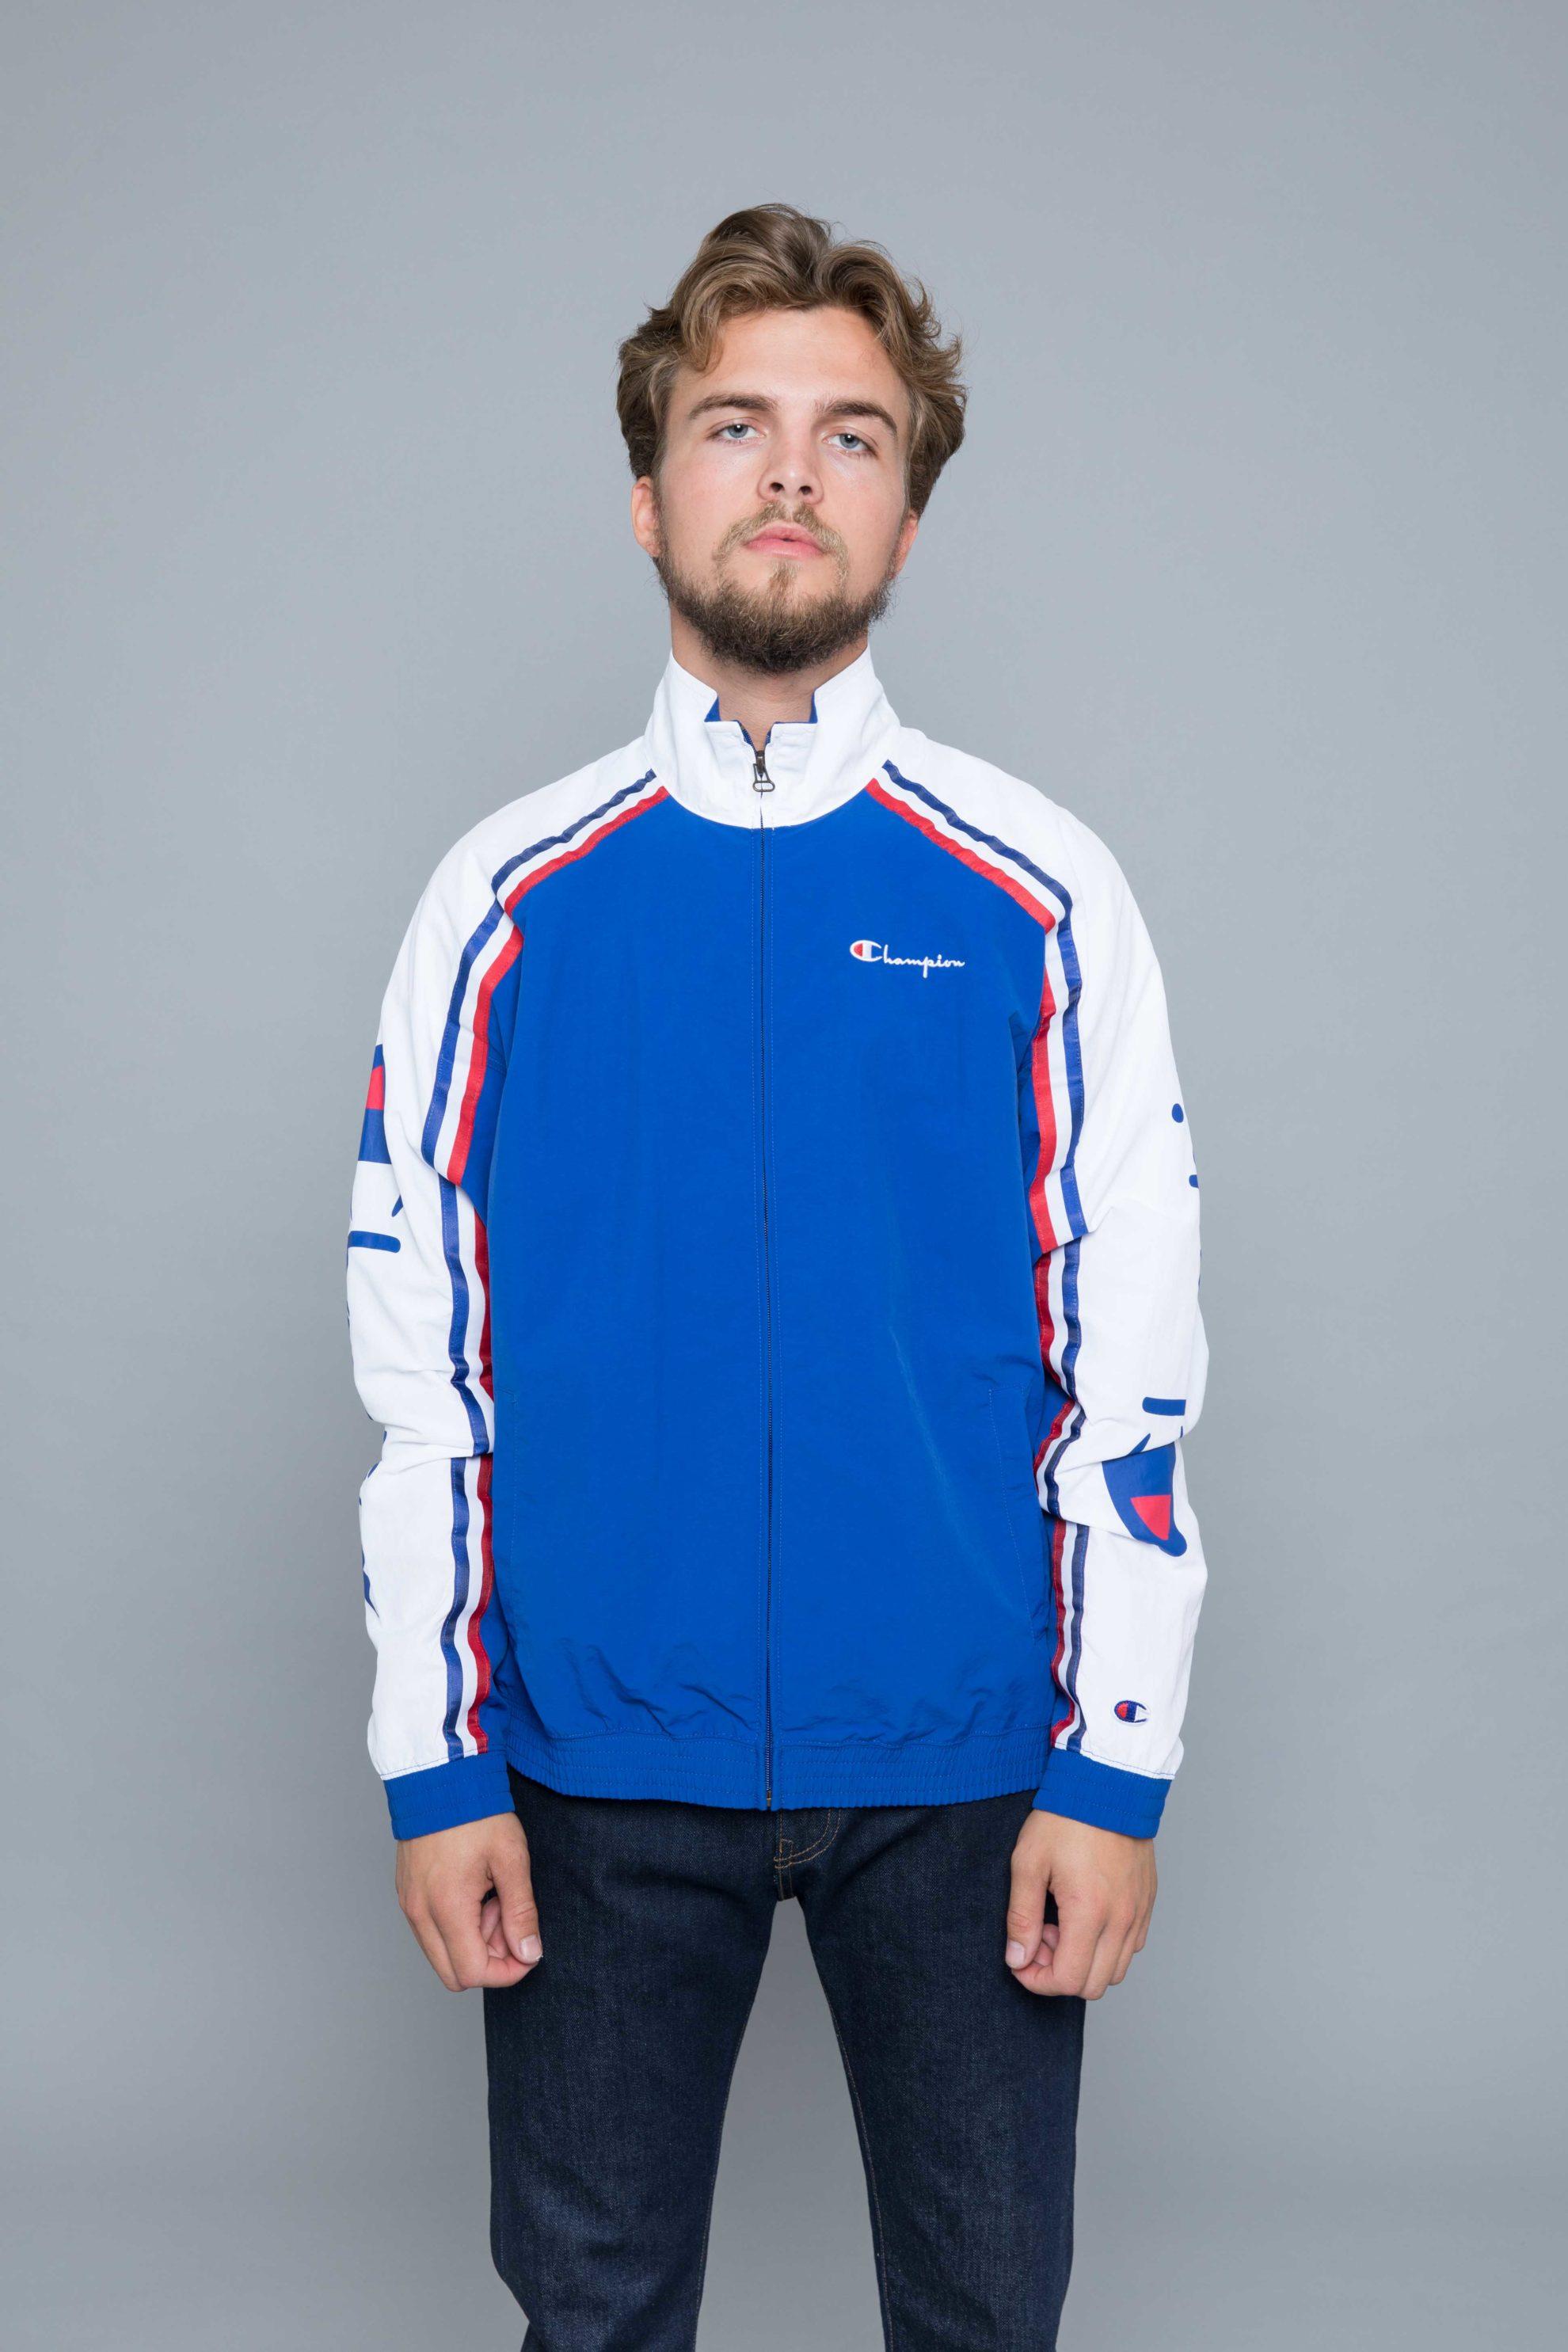 94688bdeb Champion Track Jacket Raglan Blue • Centreville Store in Brussels